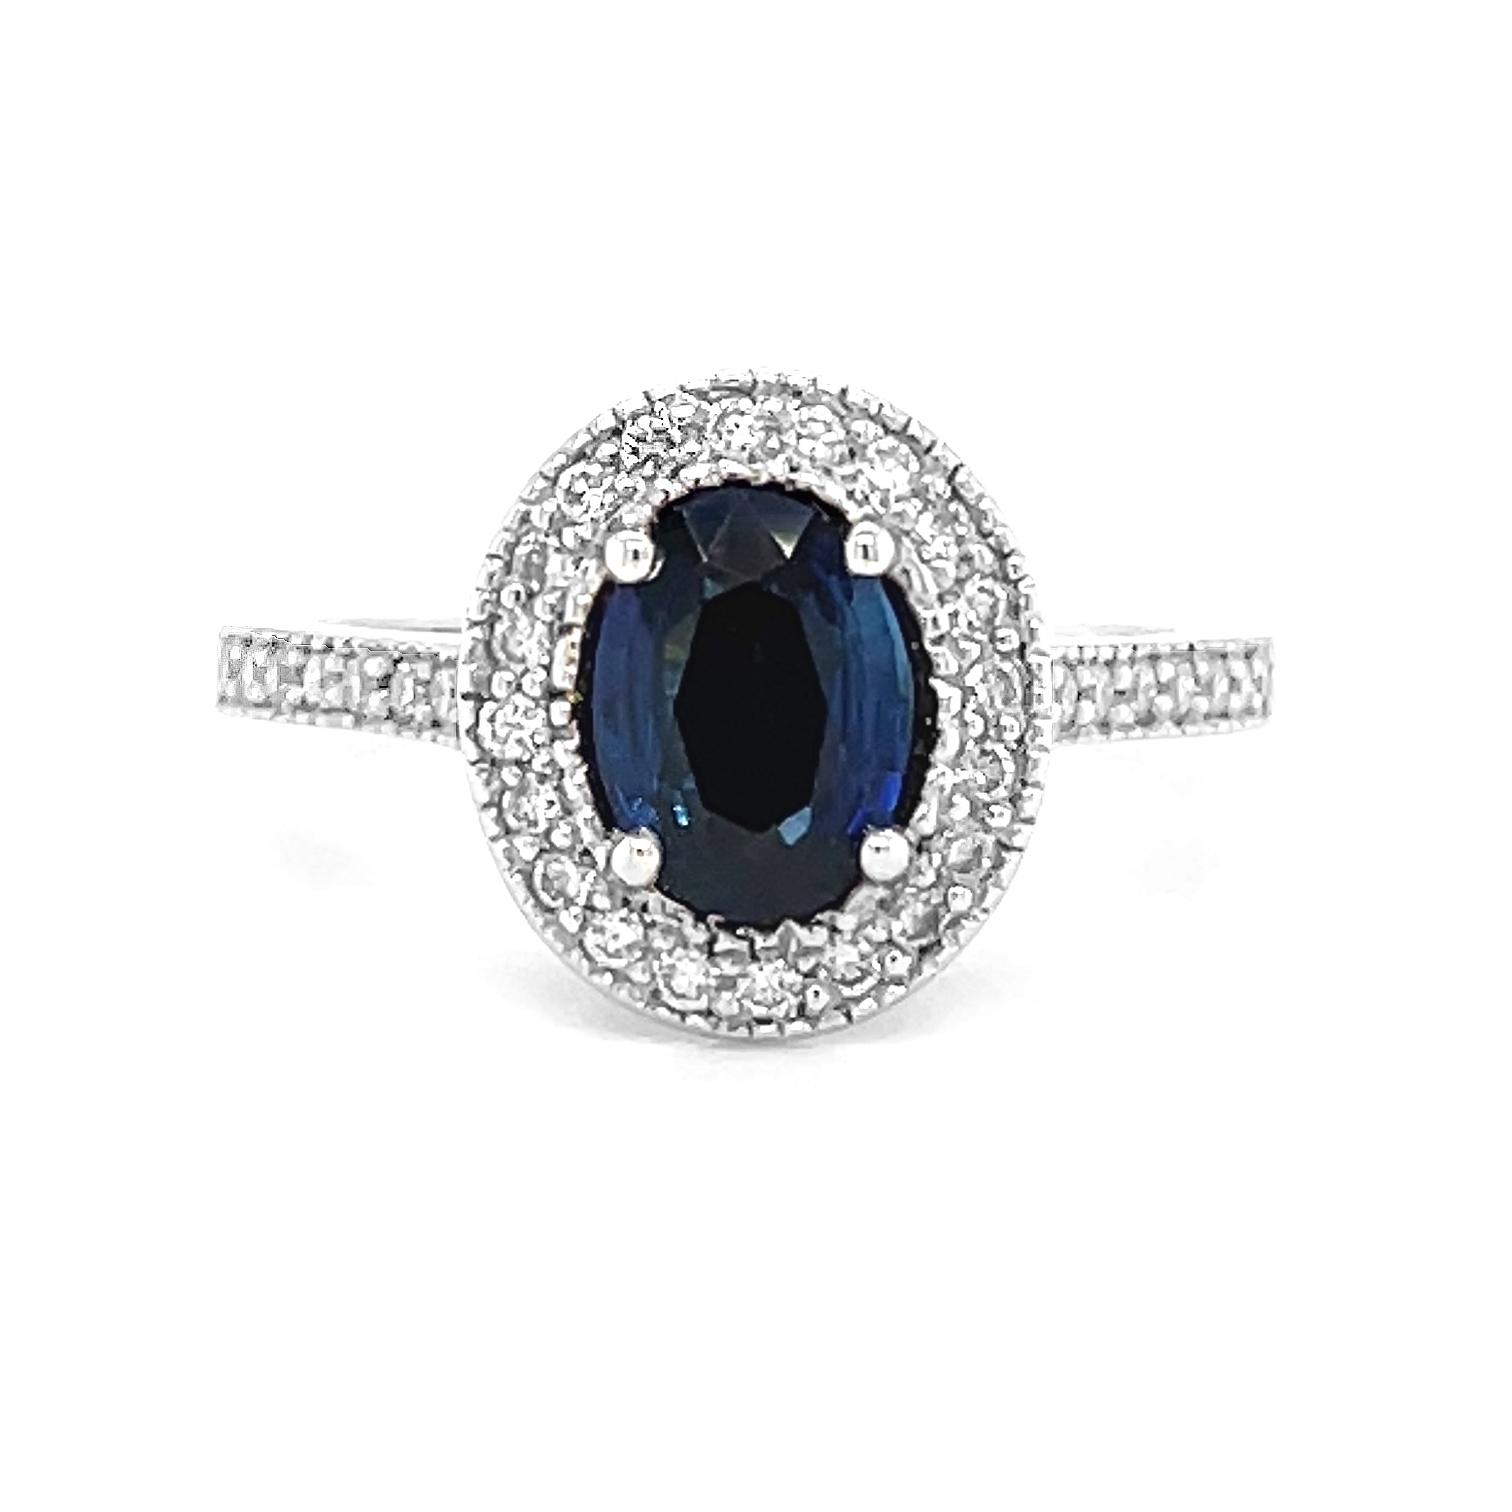 18k White Gold Oval Sapphire & Brilliant Cut Diamond Cluster Ring